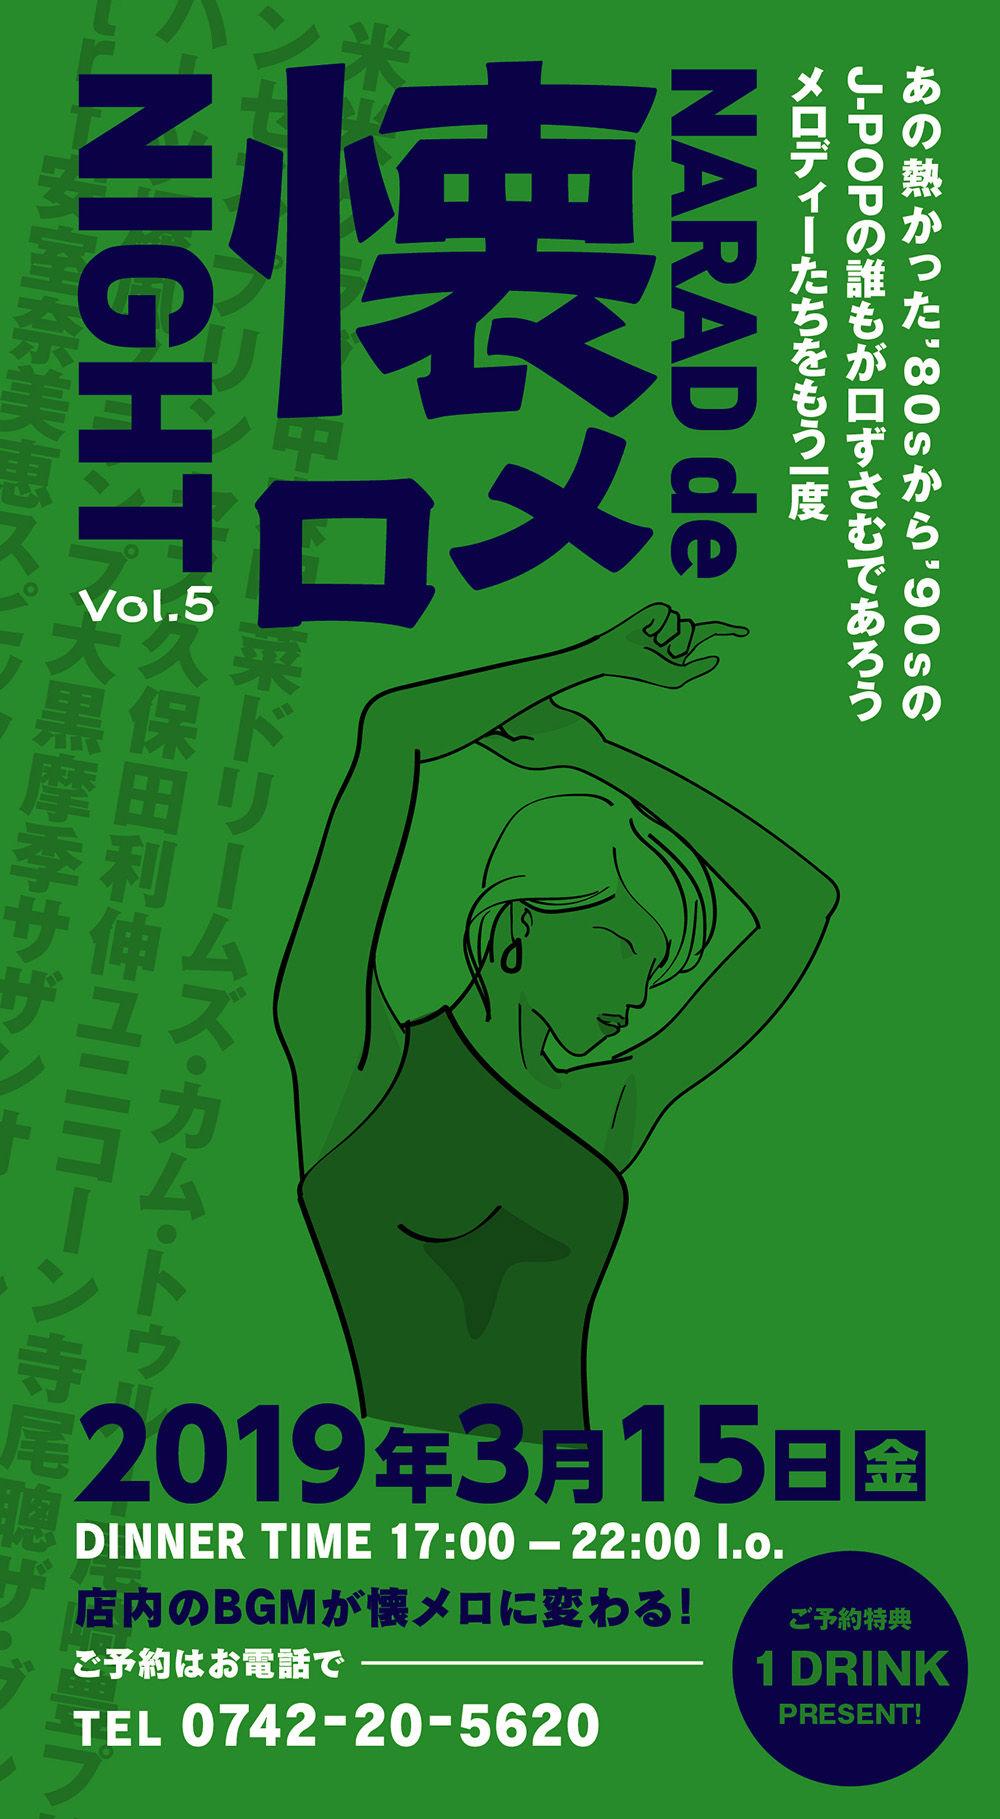 ce_190322_natsumelo-flyer_vol5-01.jpg